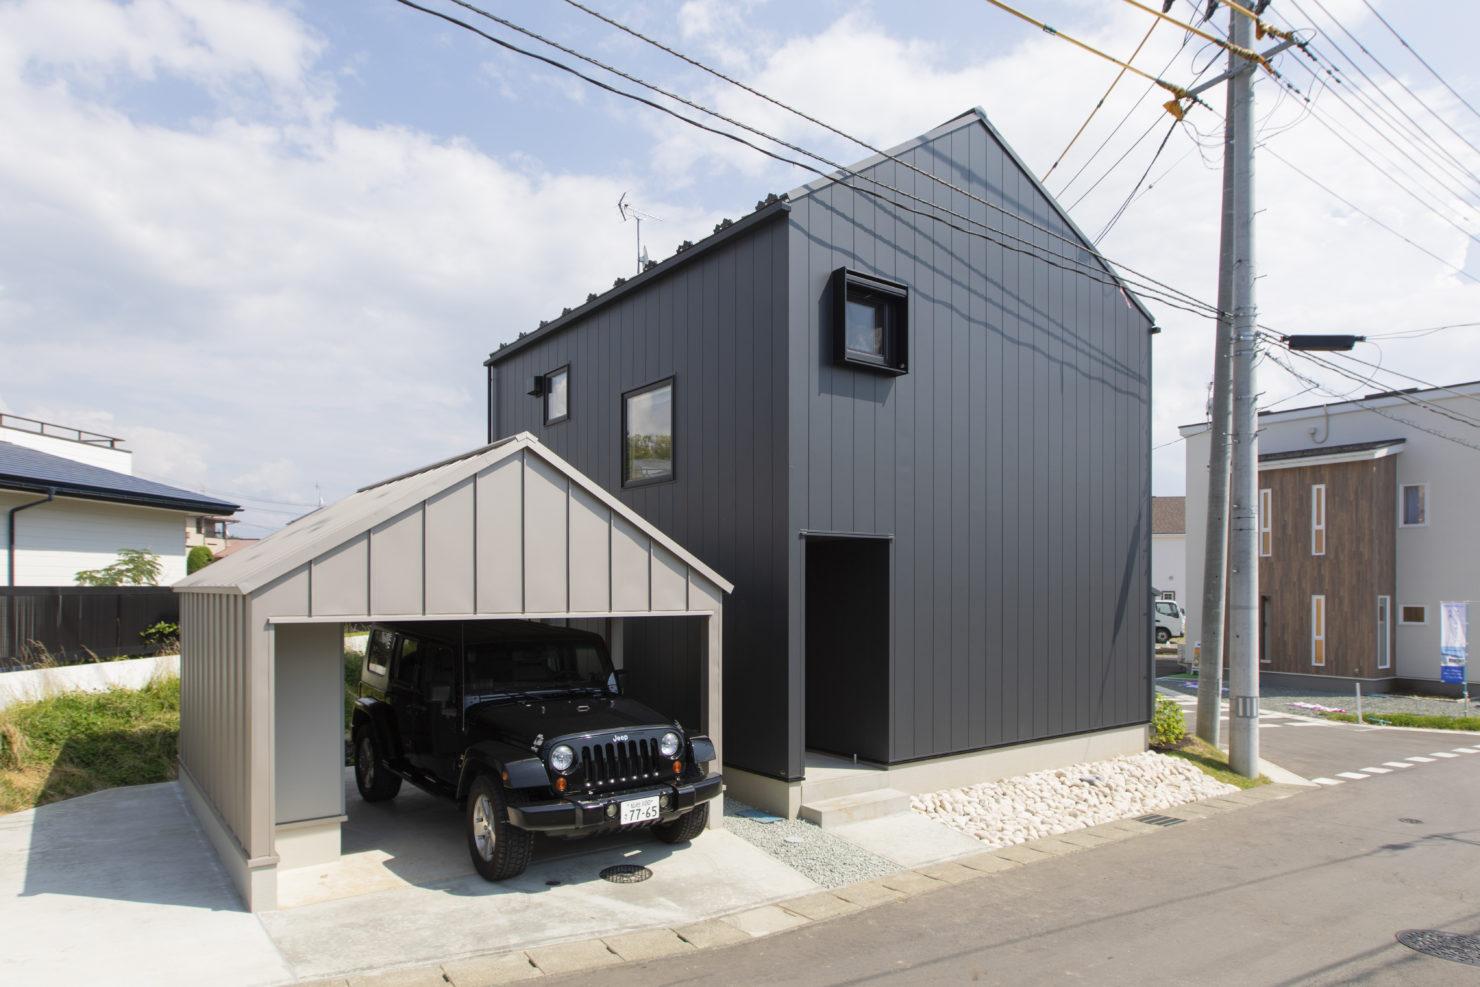 ハウスM21 盛岡市高松建売住宅 外観写真